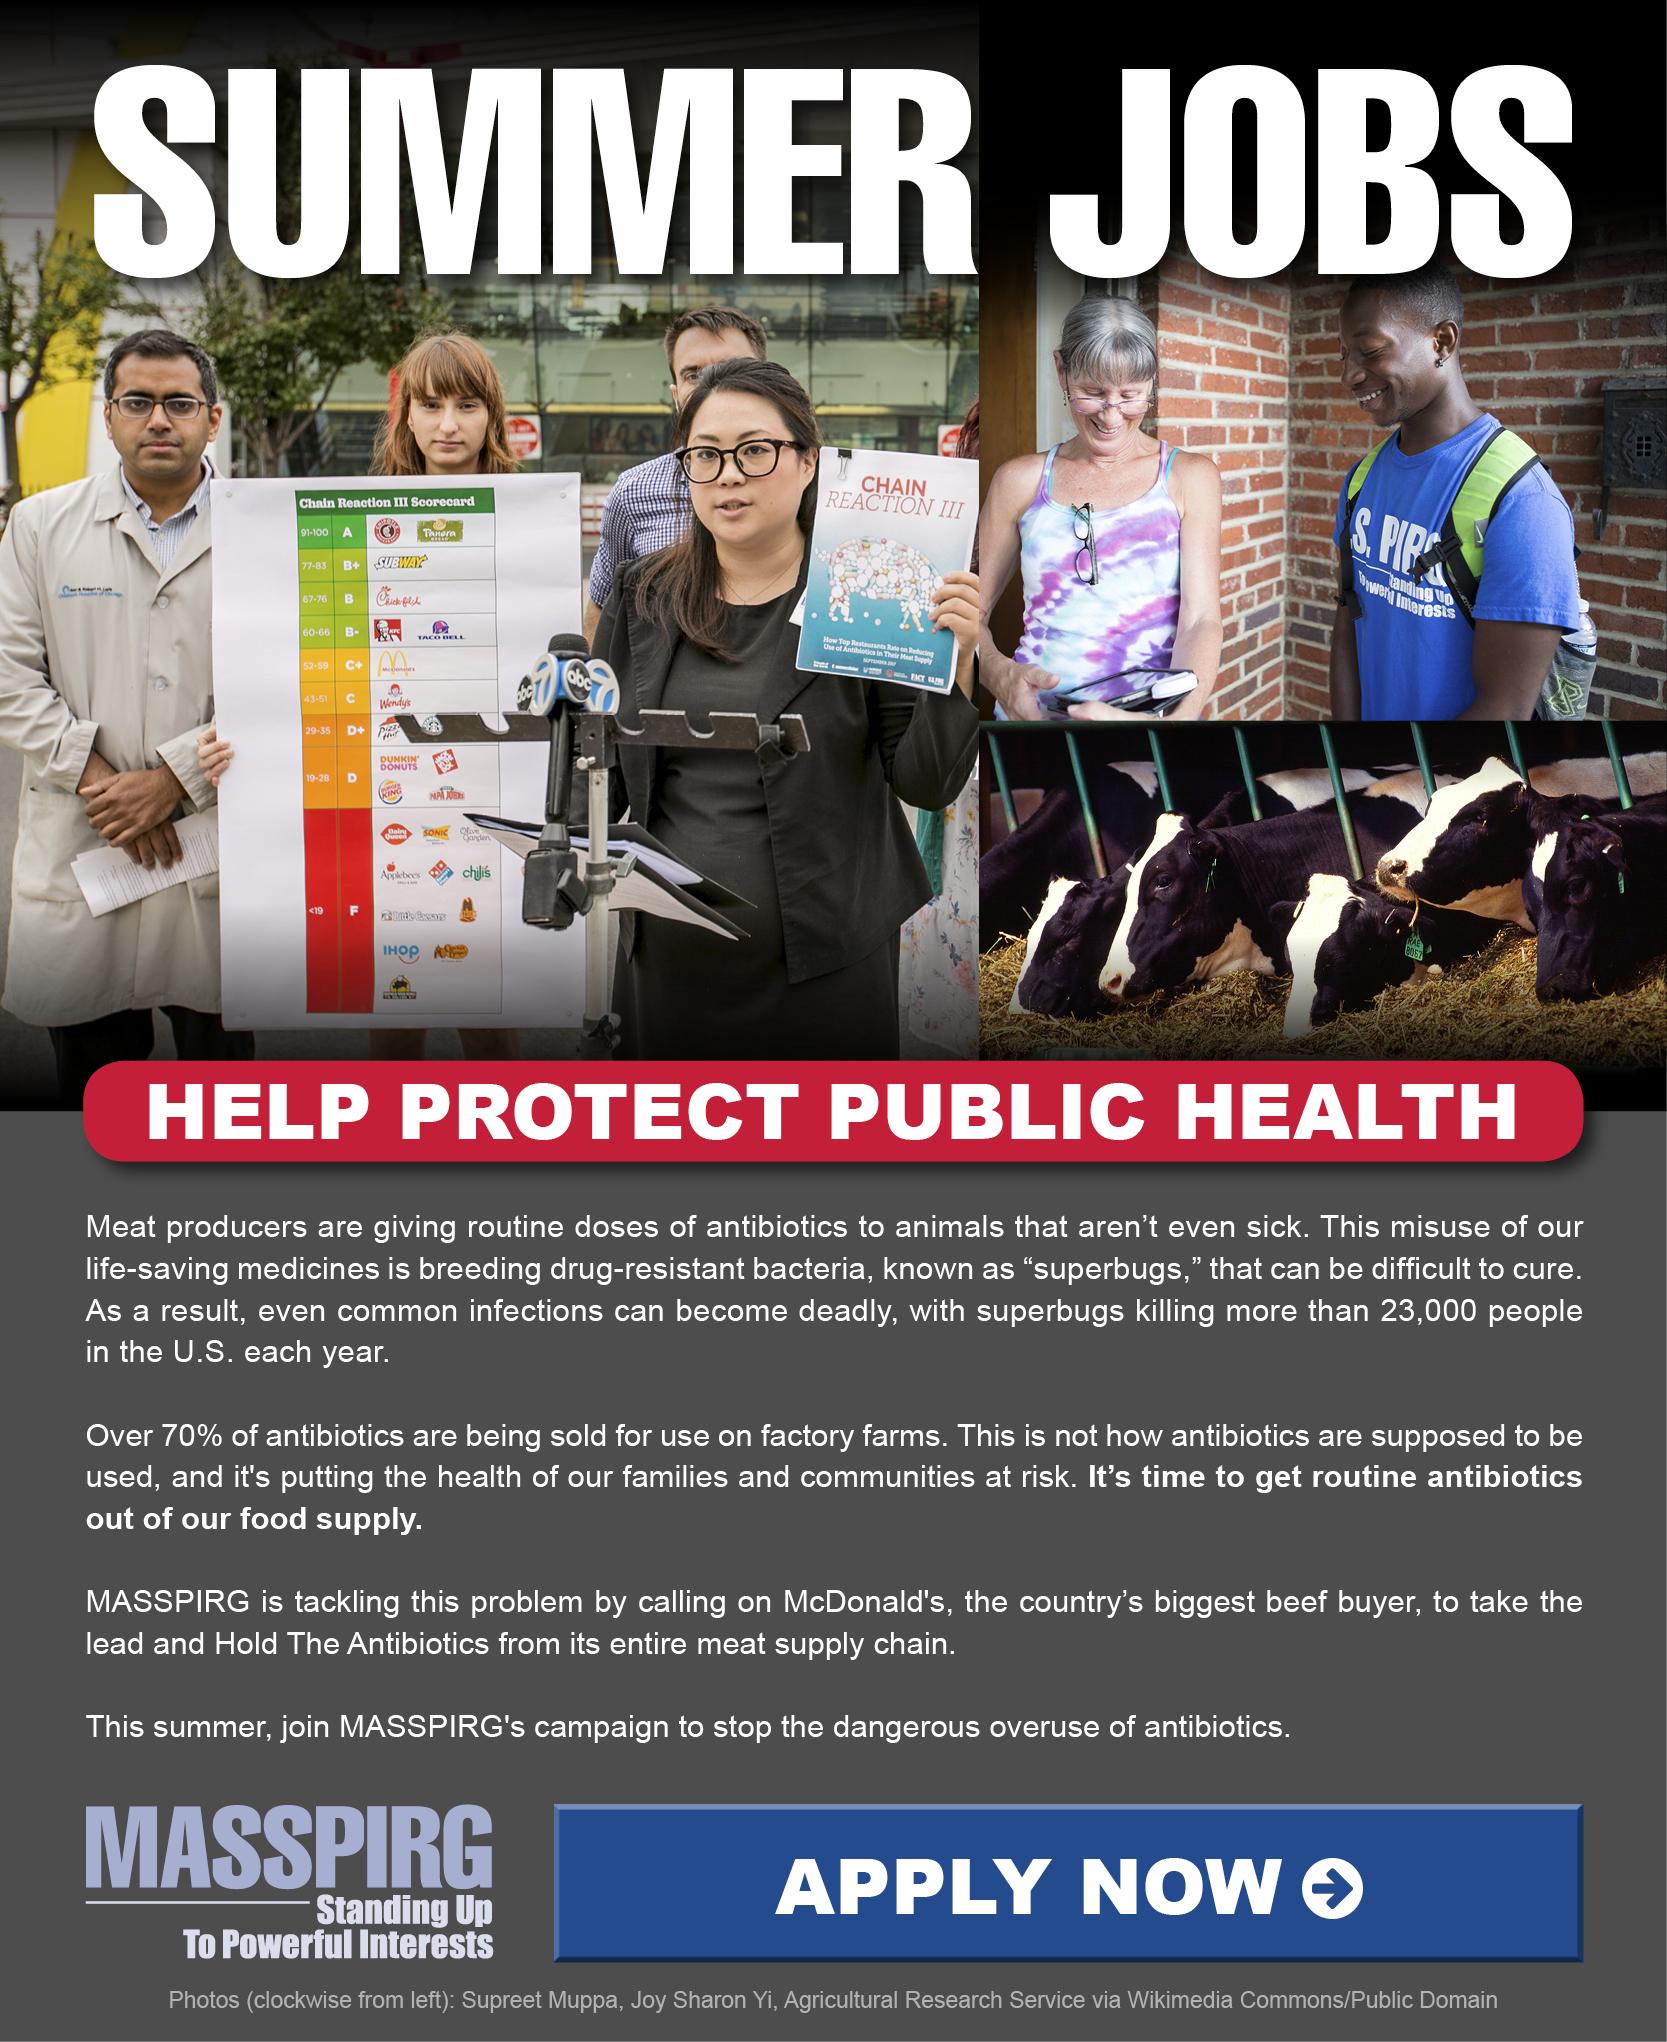 Summer Jobs. Help Protect Public Health.